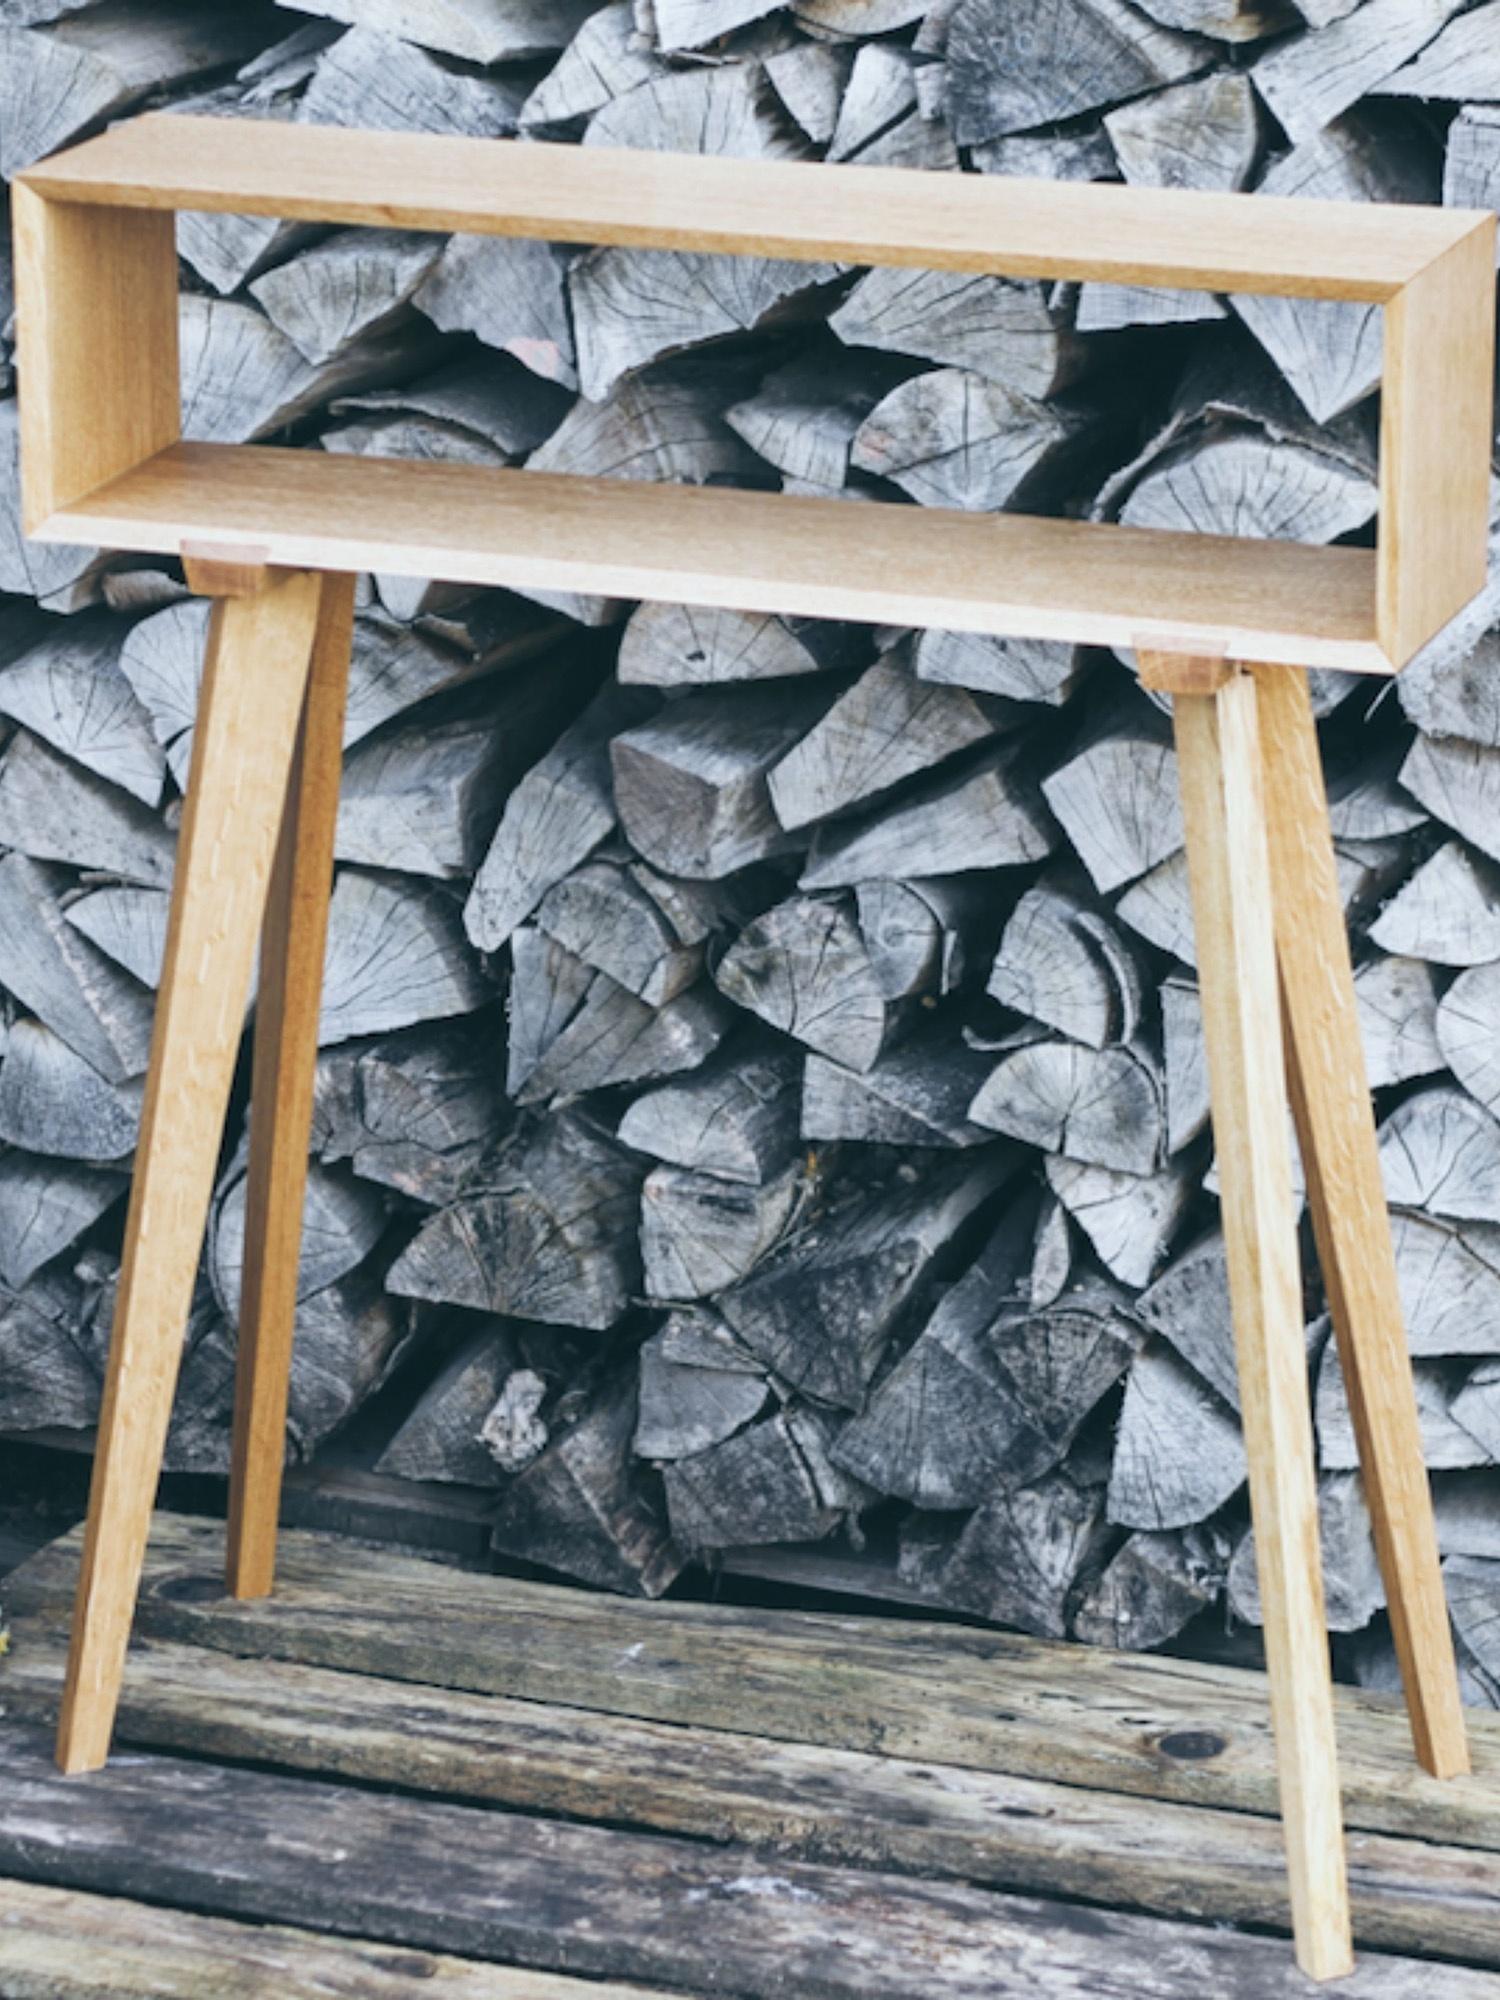 WoodHock Designprojekte Unikate Holzmöbel Designmöbel